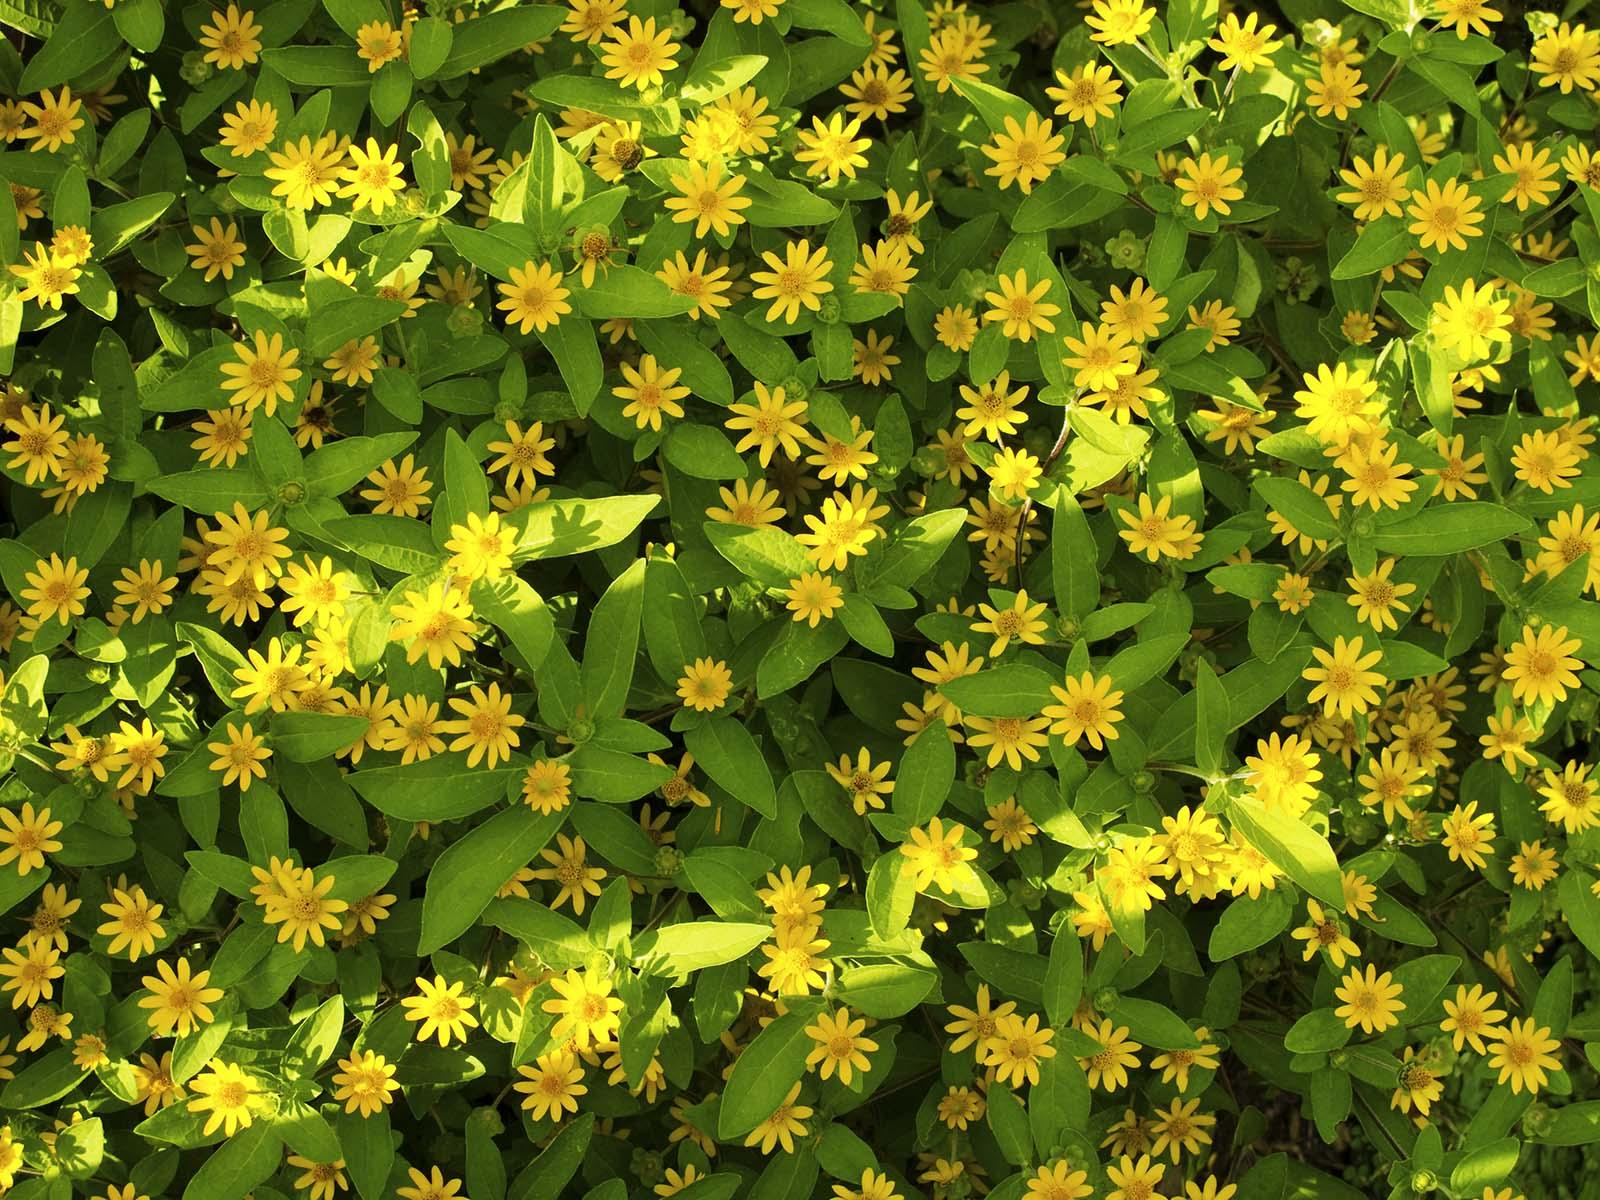 Yellow Flowers By Name 10 Desktop Background Hdflowerwallpaper